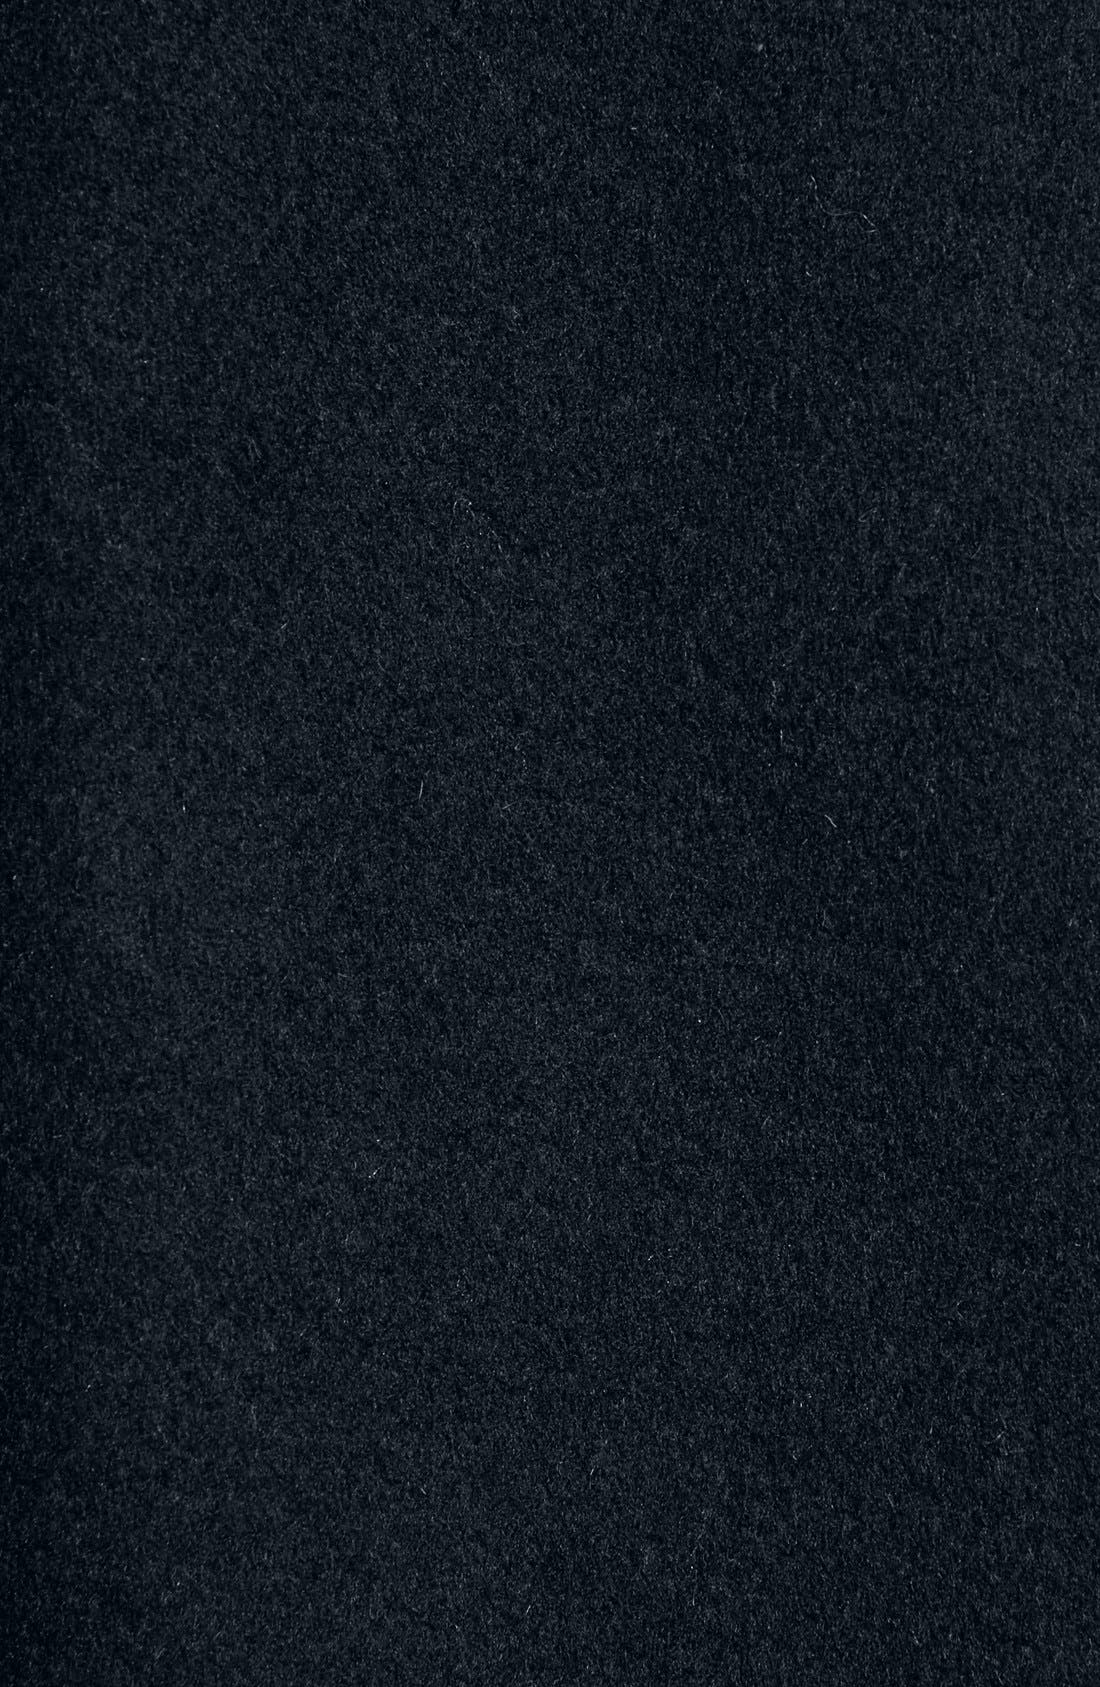 Wool Blend Long Military Coat,                             Alternate thumbnail 27, color,